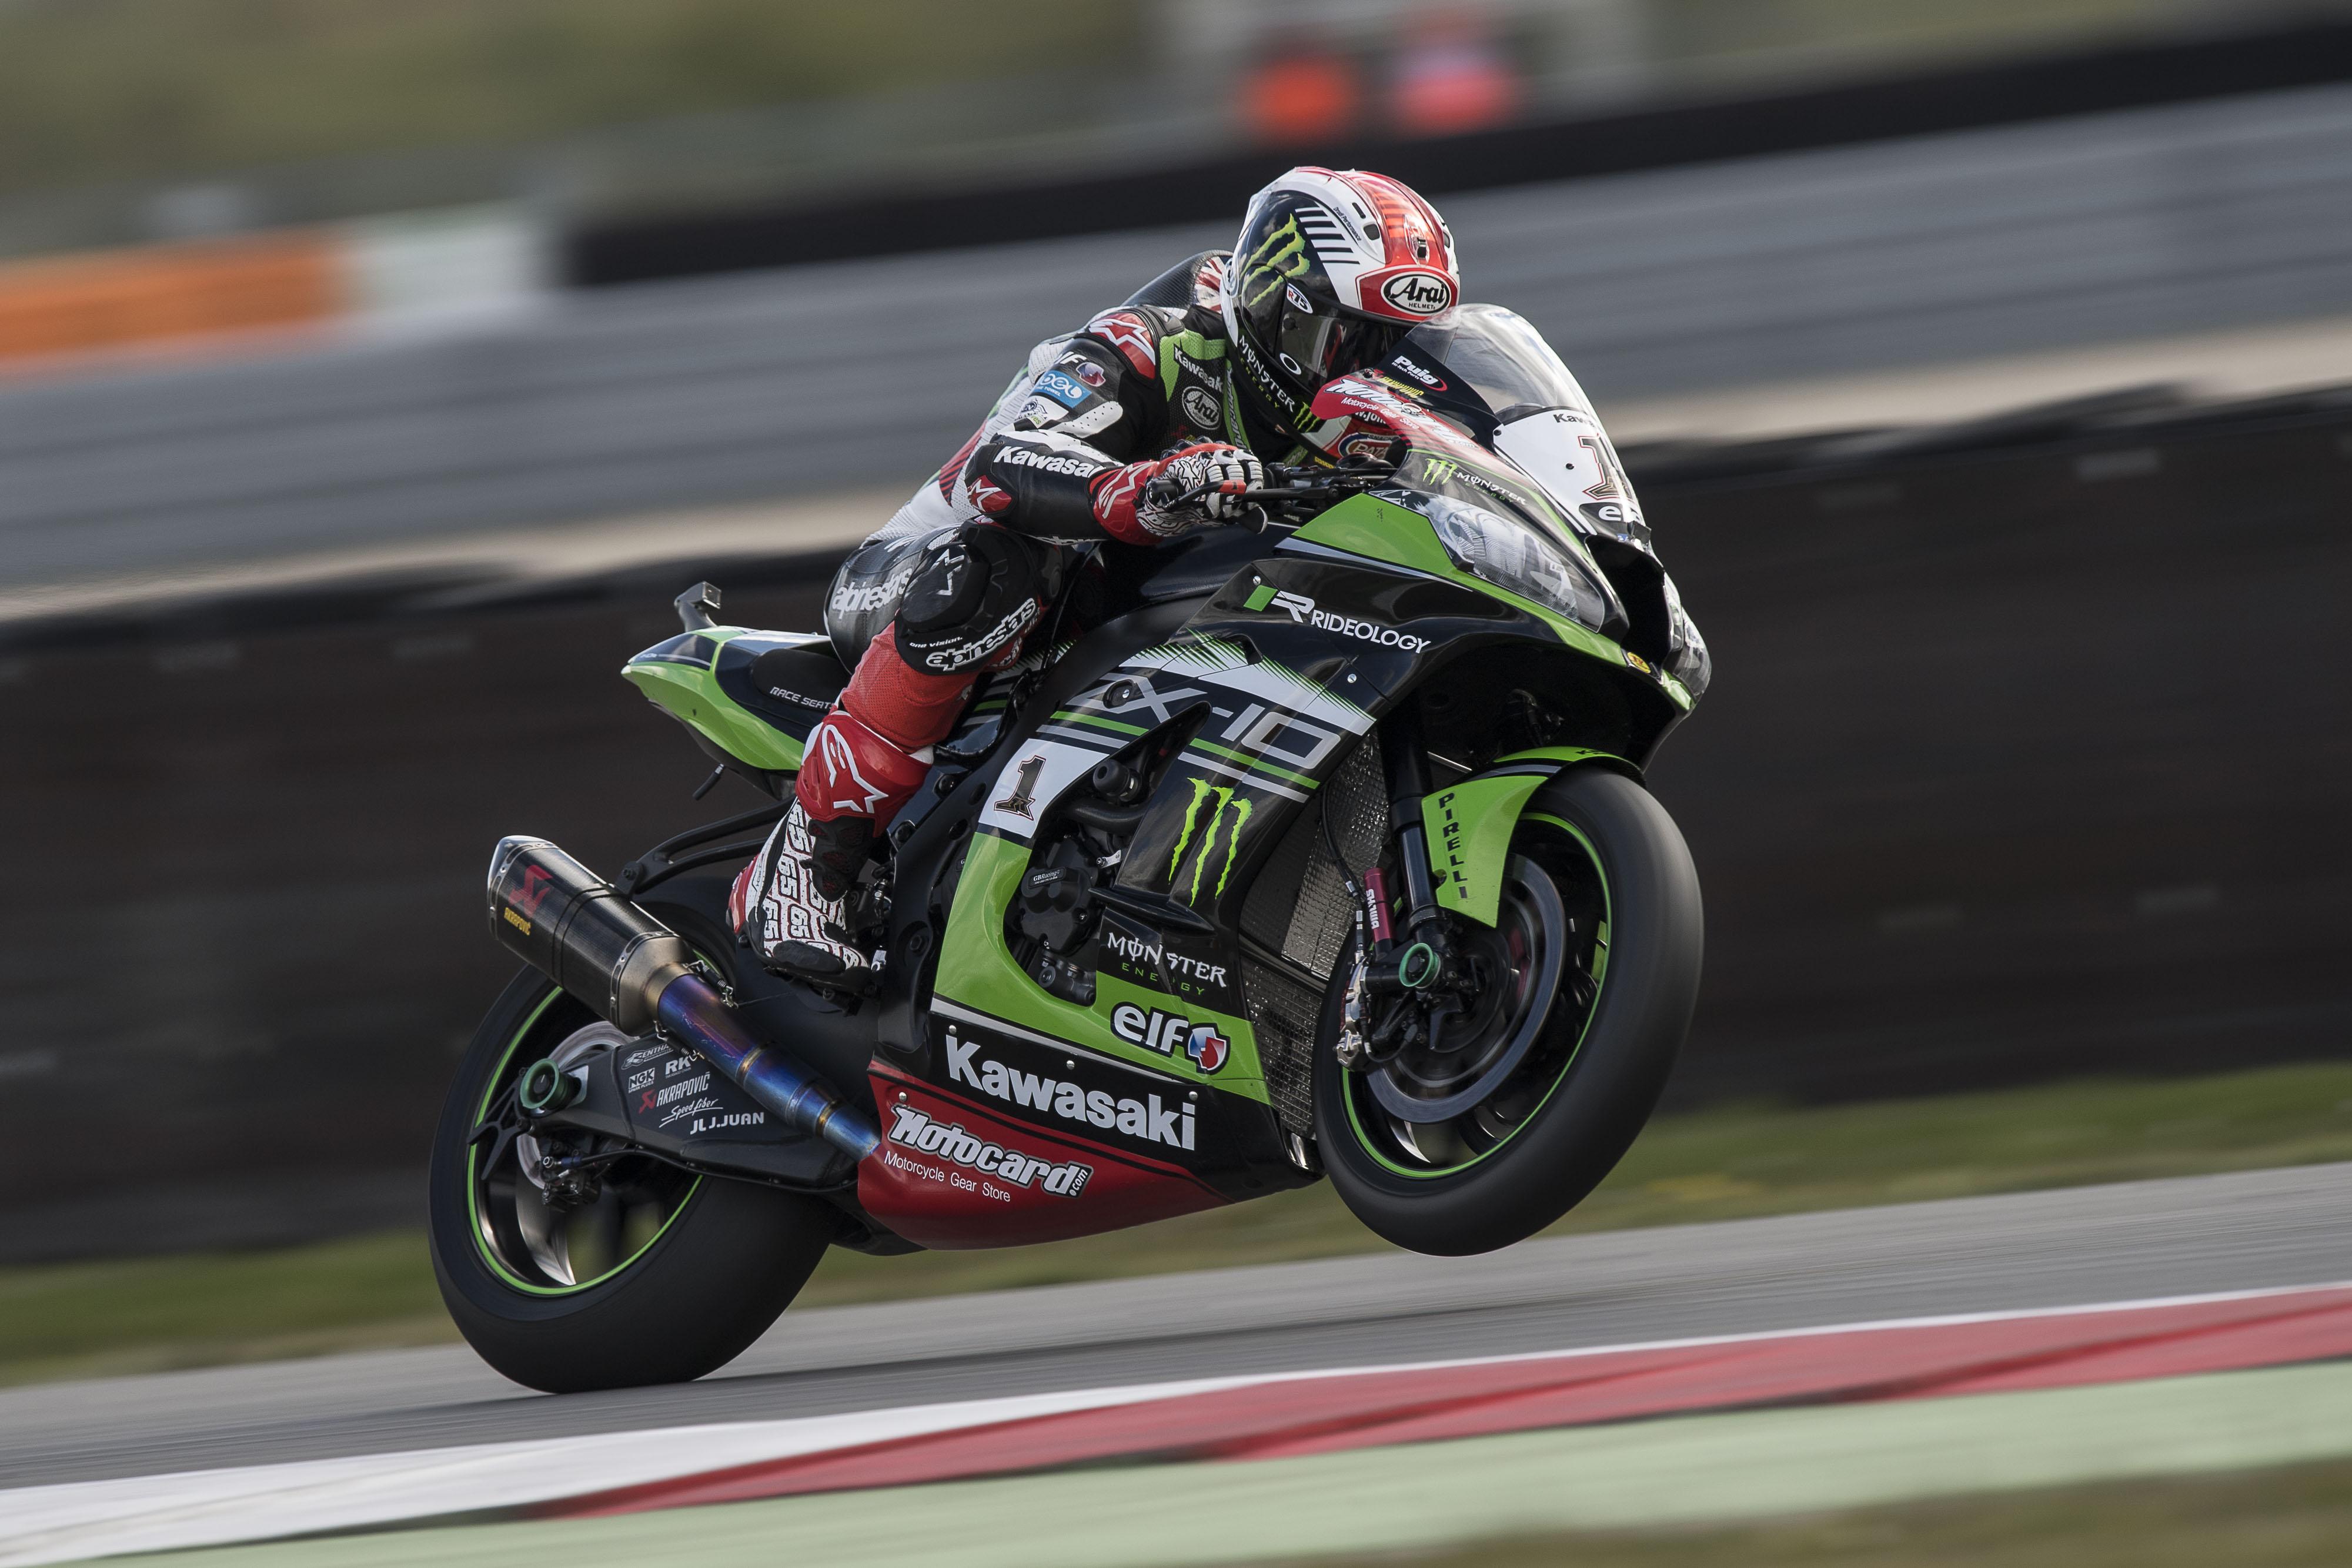 Jonathan Rea gana en Assen tras un fallo de la Ducati de Davies